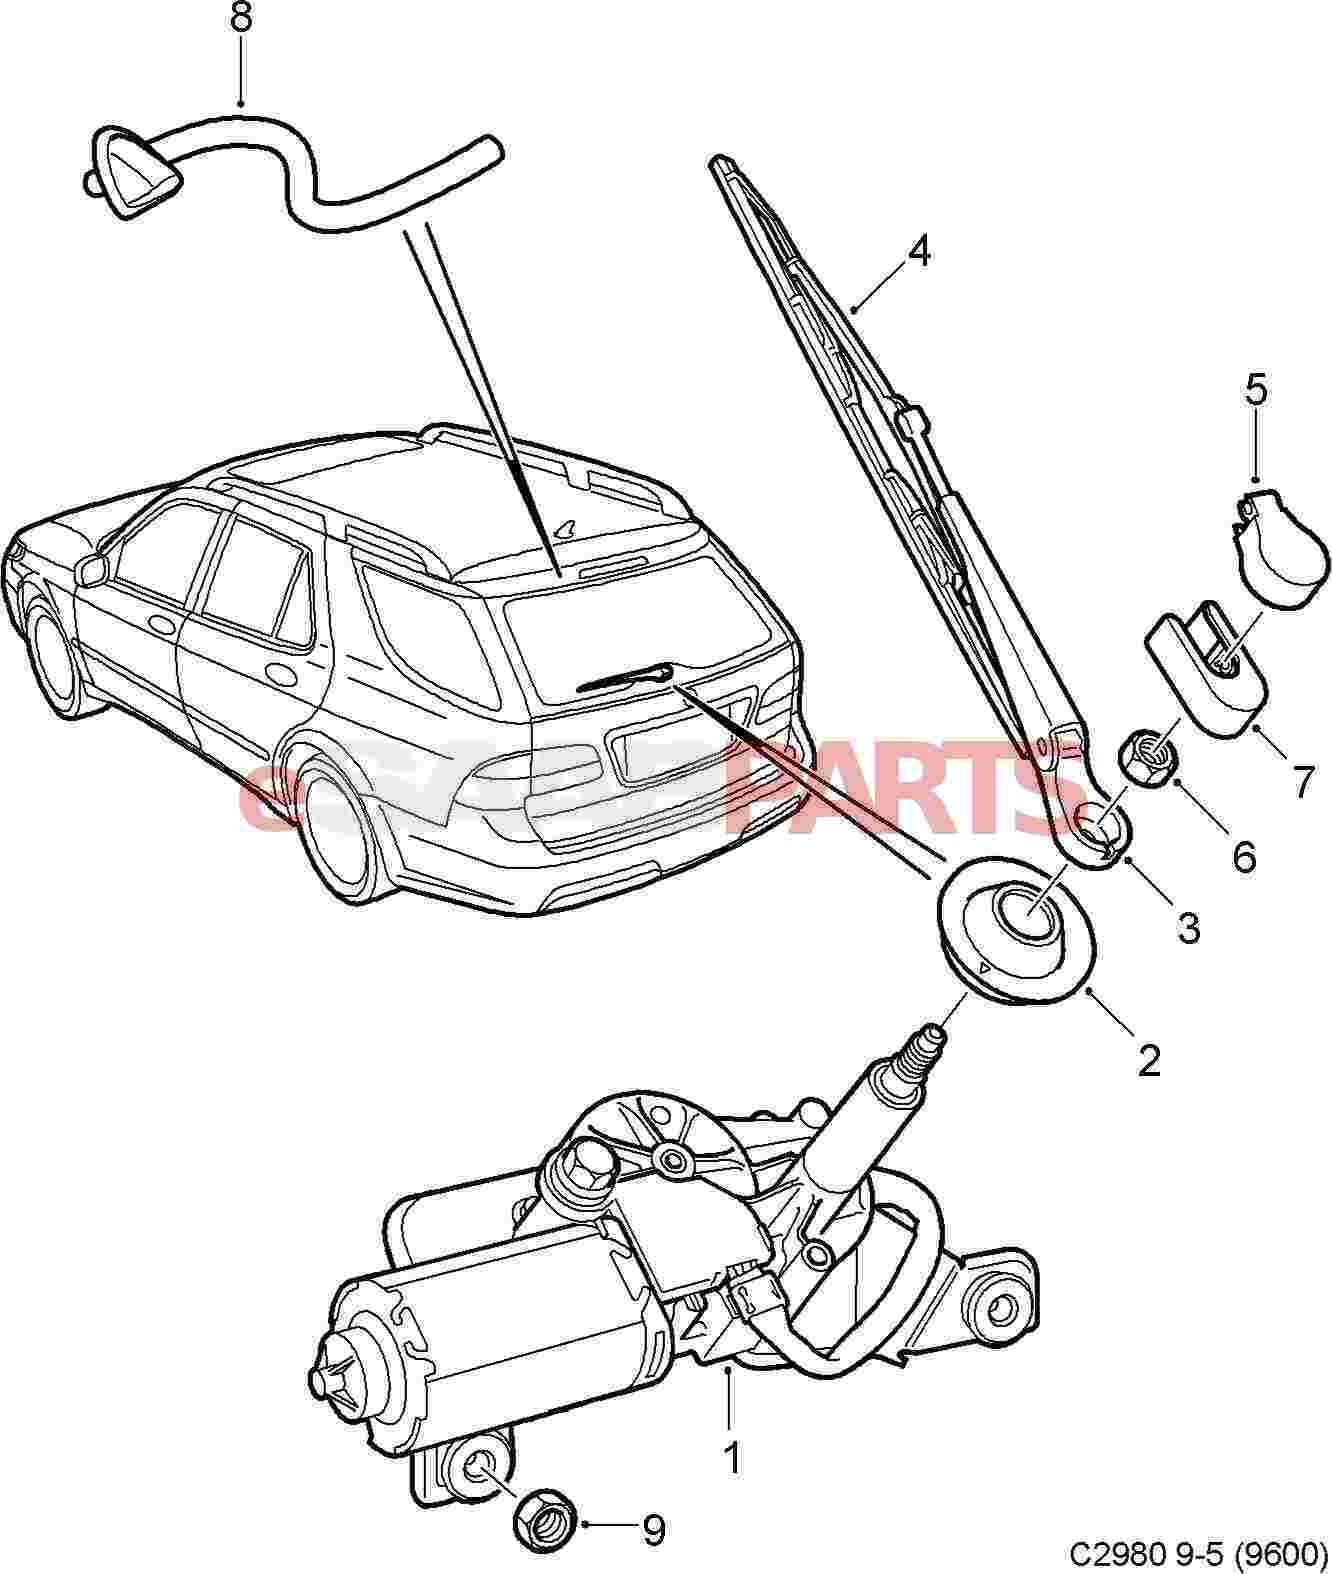 2004 saab 9 5 Motor diagram